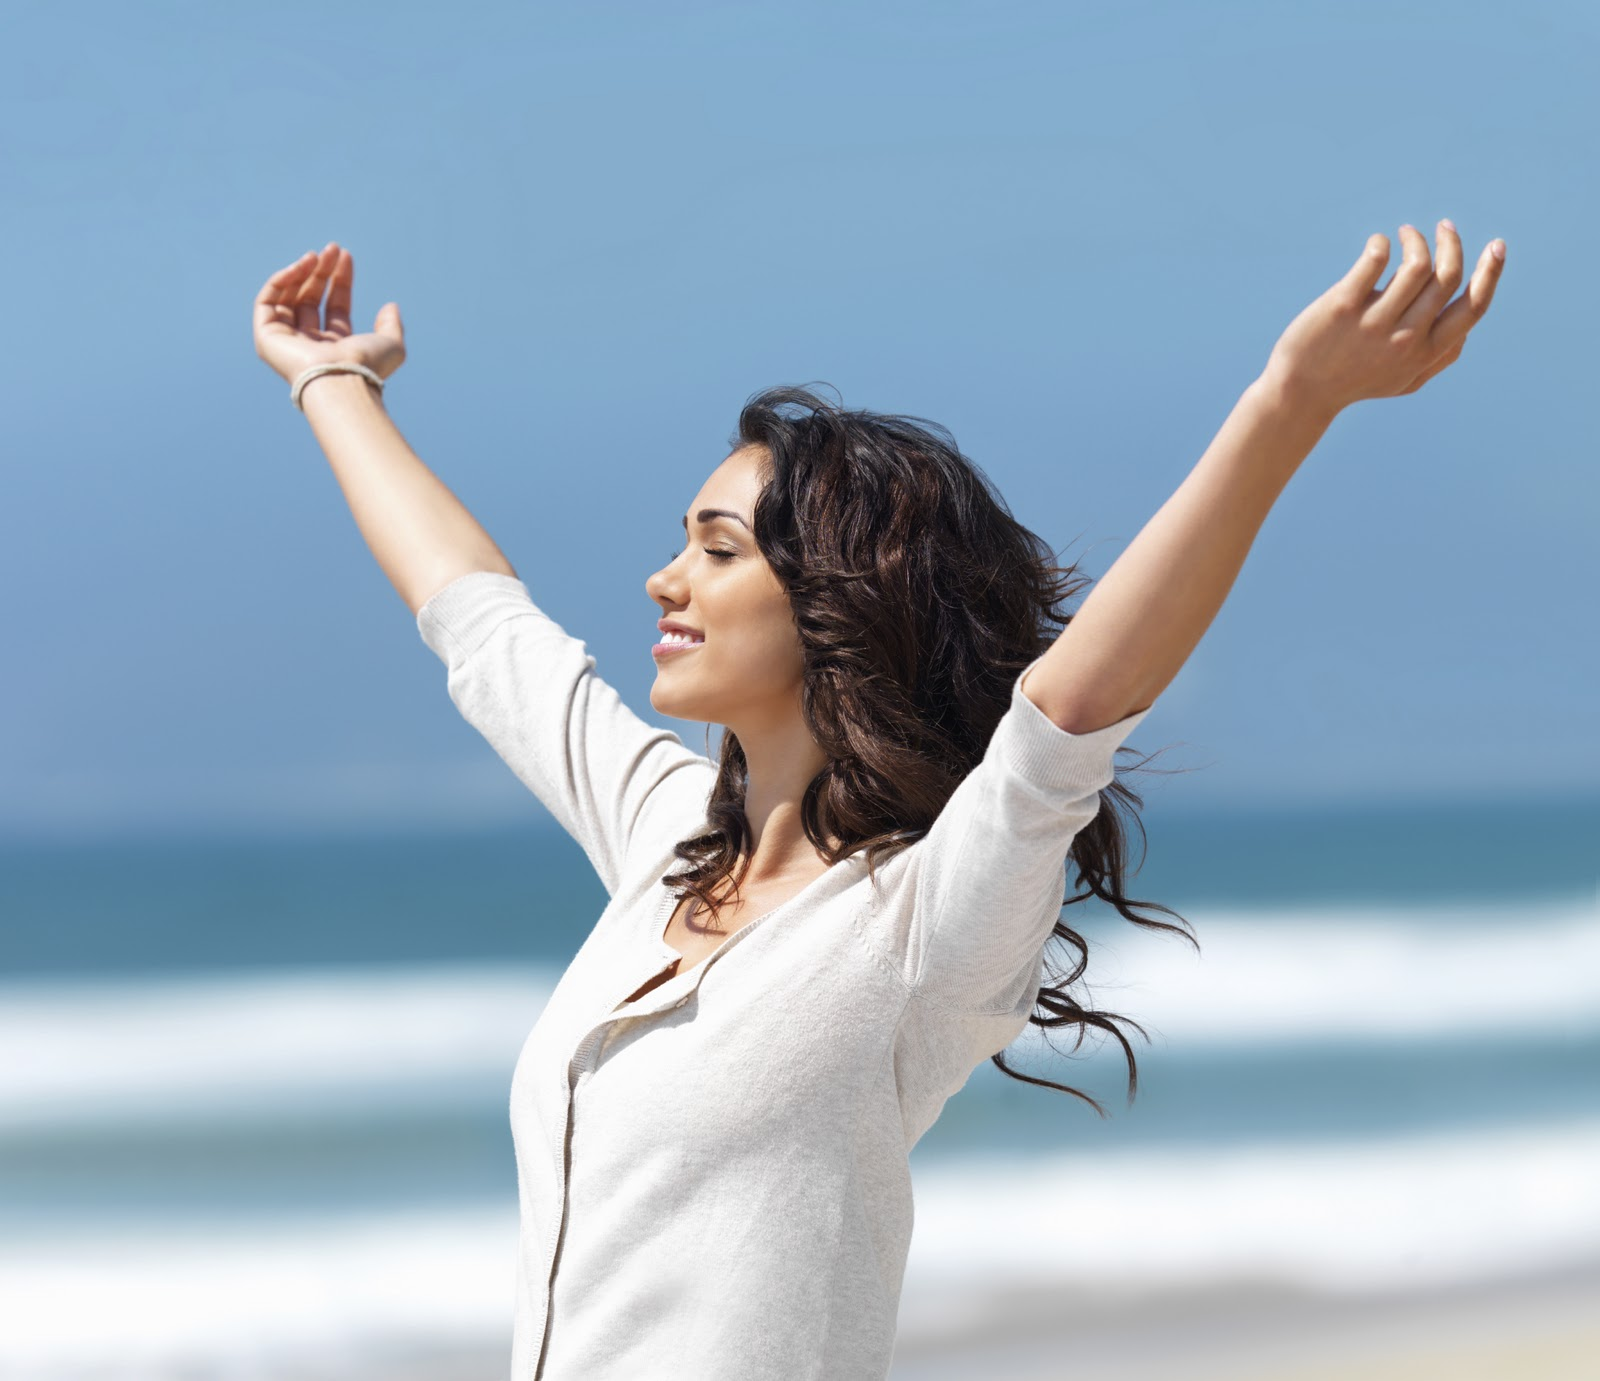 http://pauleannareid.com/wp-content/uploads/2012/07/happy-woman.jpg